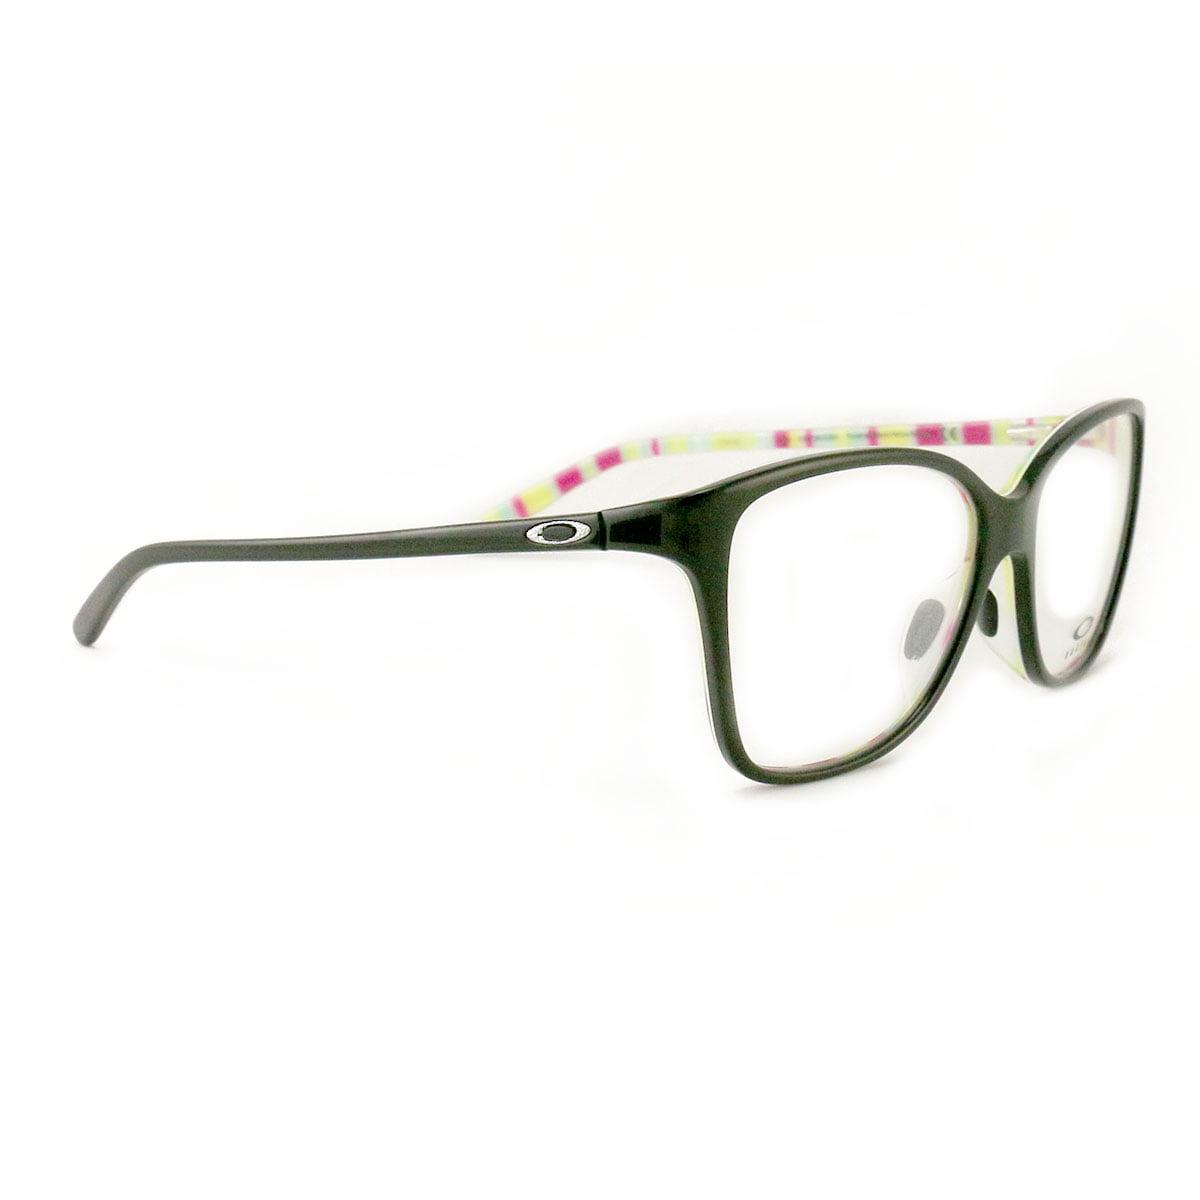 5328f21b71 Oakley 0OX1126 Finesse Full Rim Square Eyeglasses for Womens - Size 54 -  Walmart.com